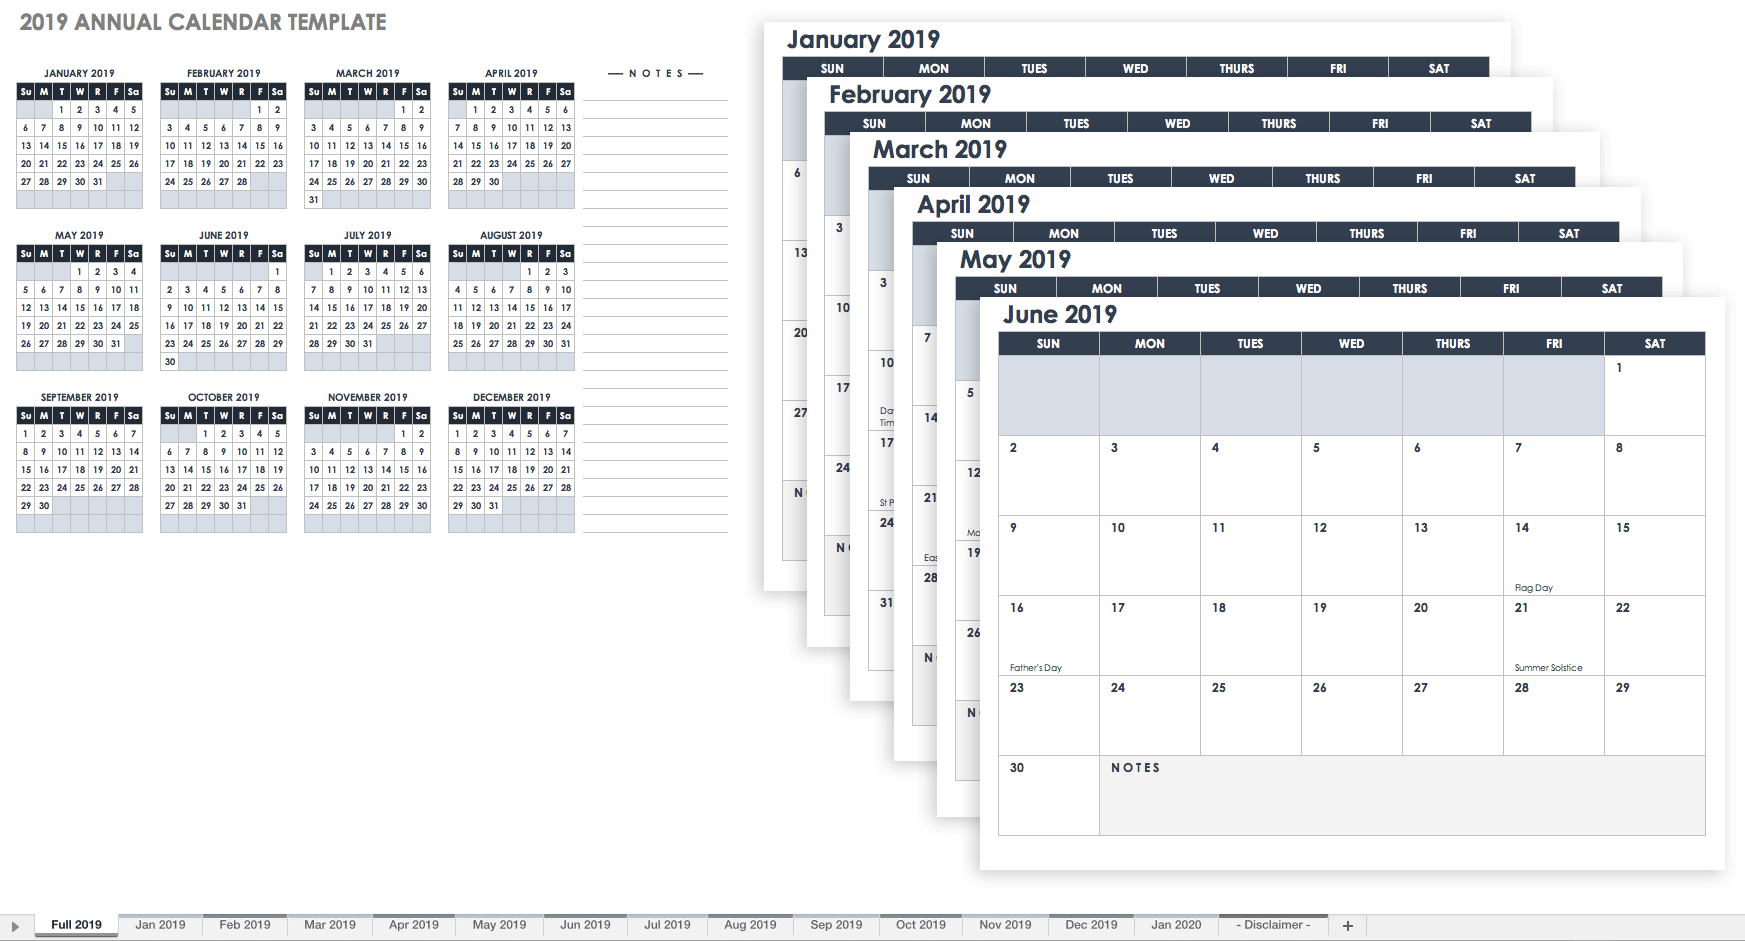 15 Free Monthly Calendar Templates | Smartsheet in Printable Calendar 2019 2020 Write On